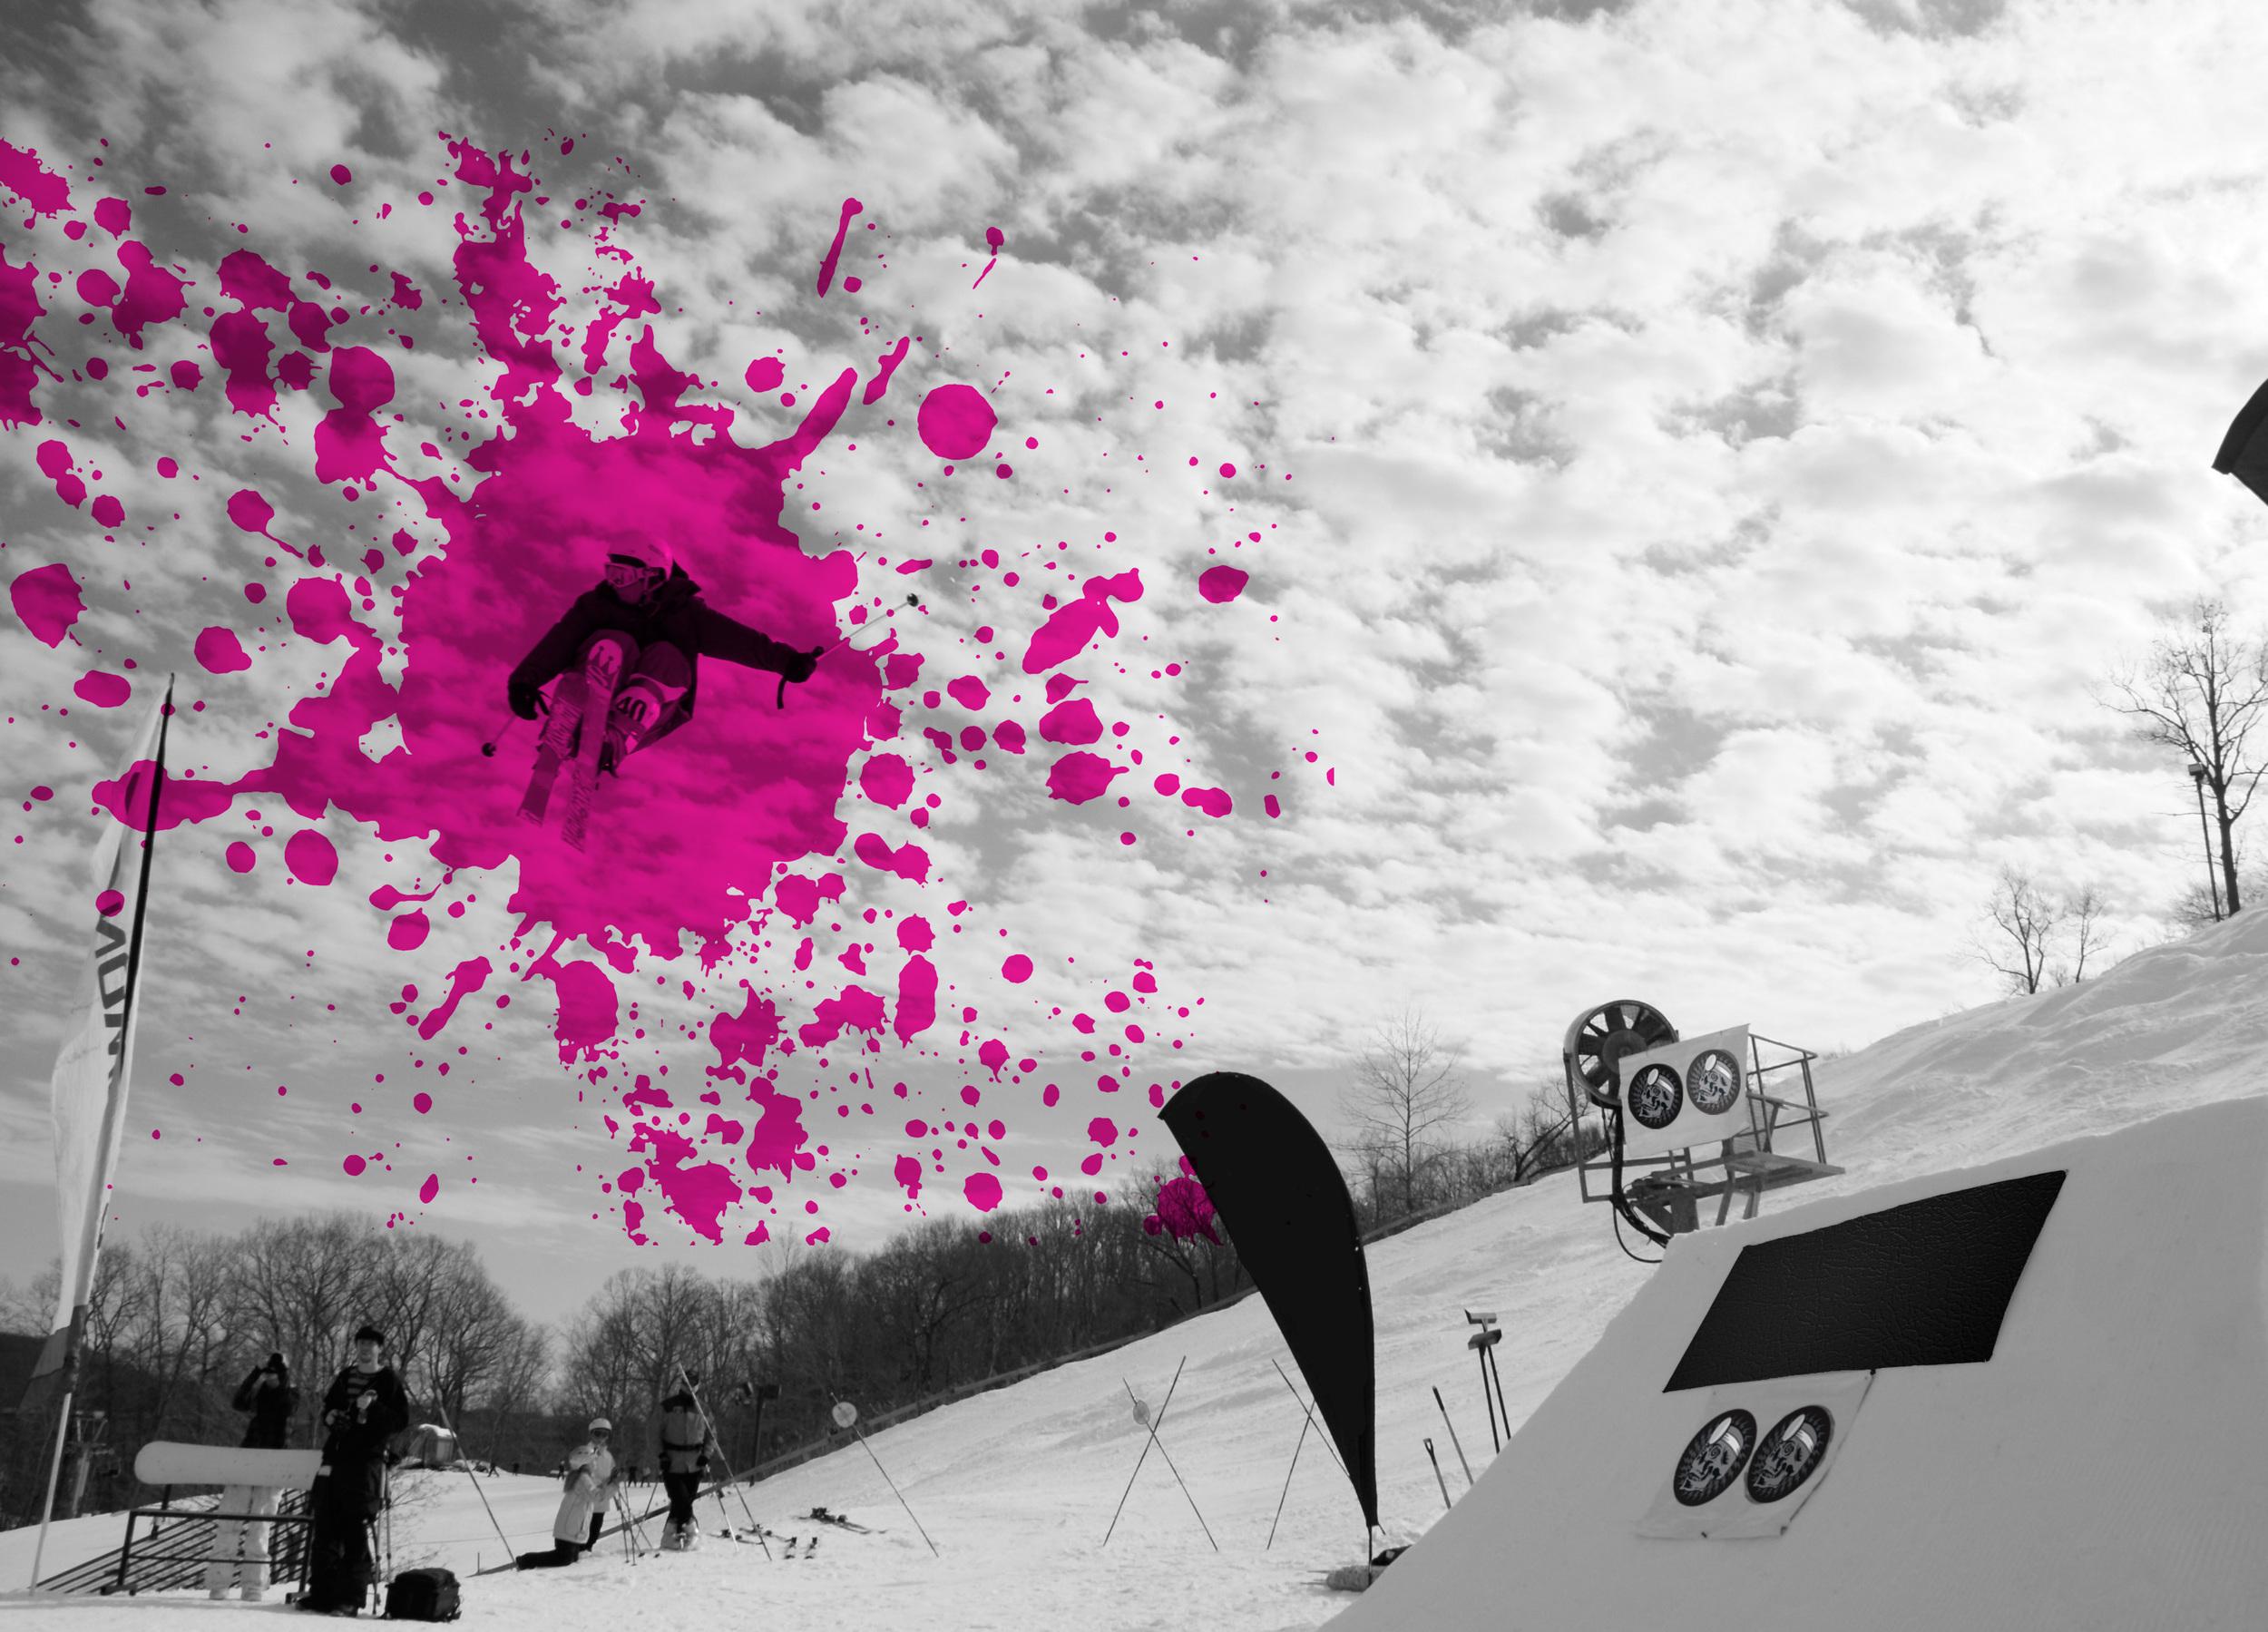 About_Ski.jpg